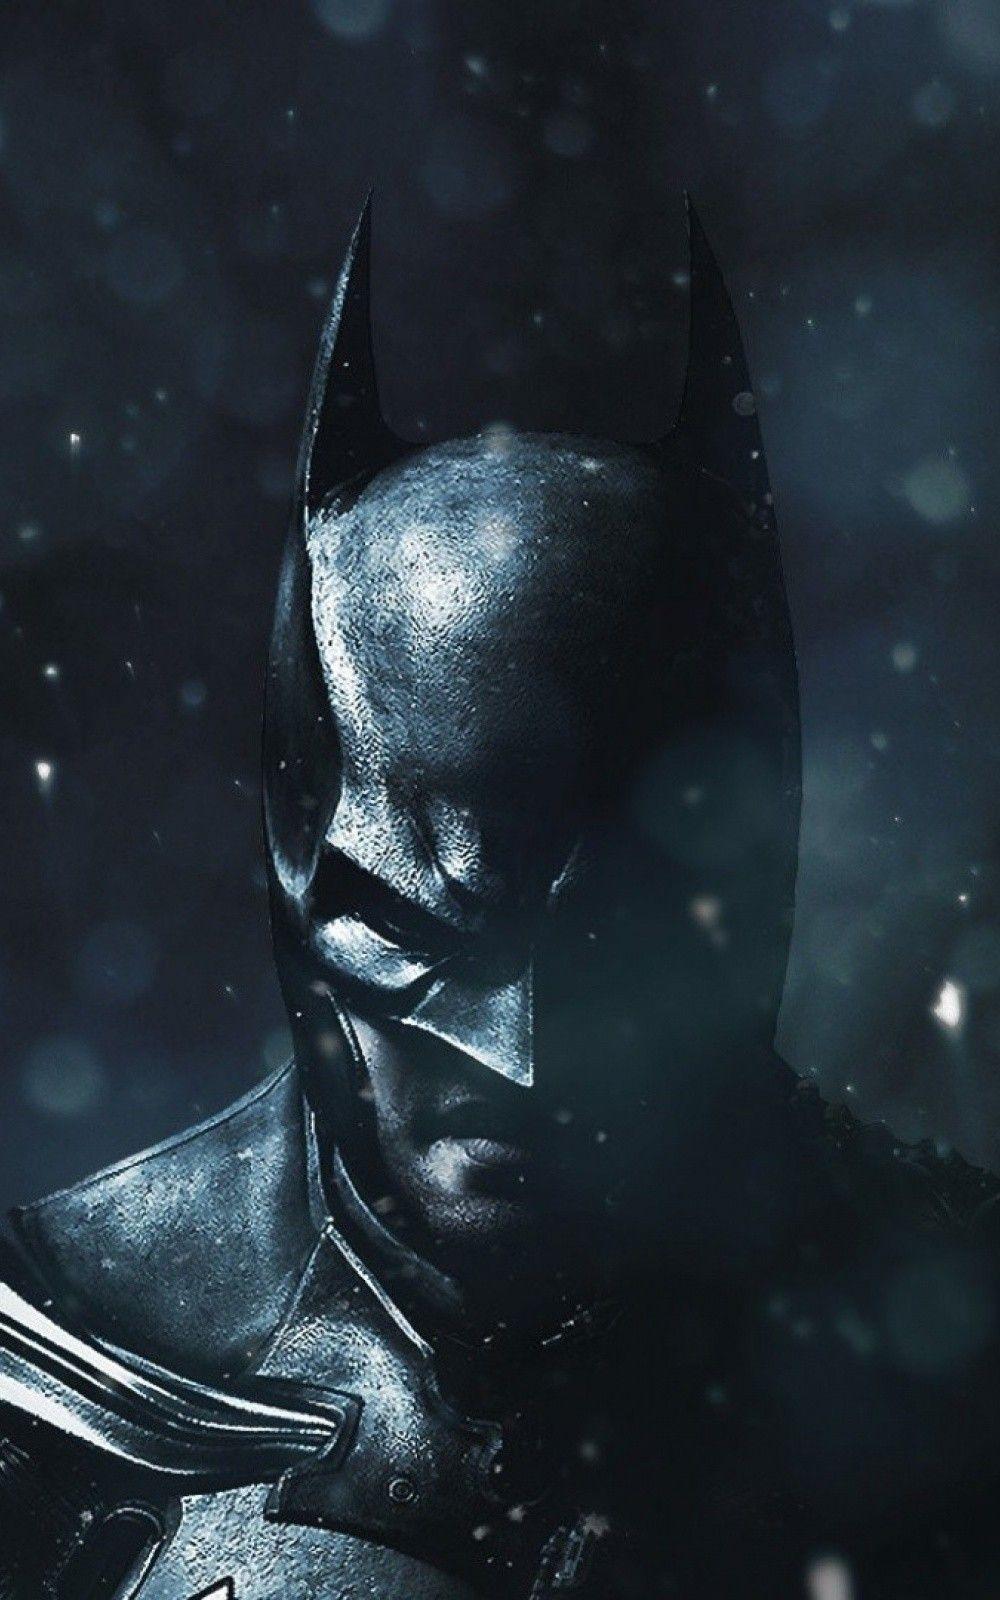 batman wallpaper hd for mobile